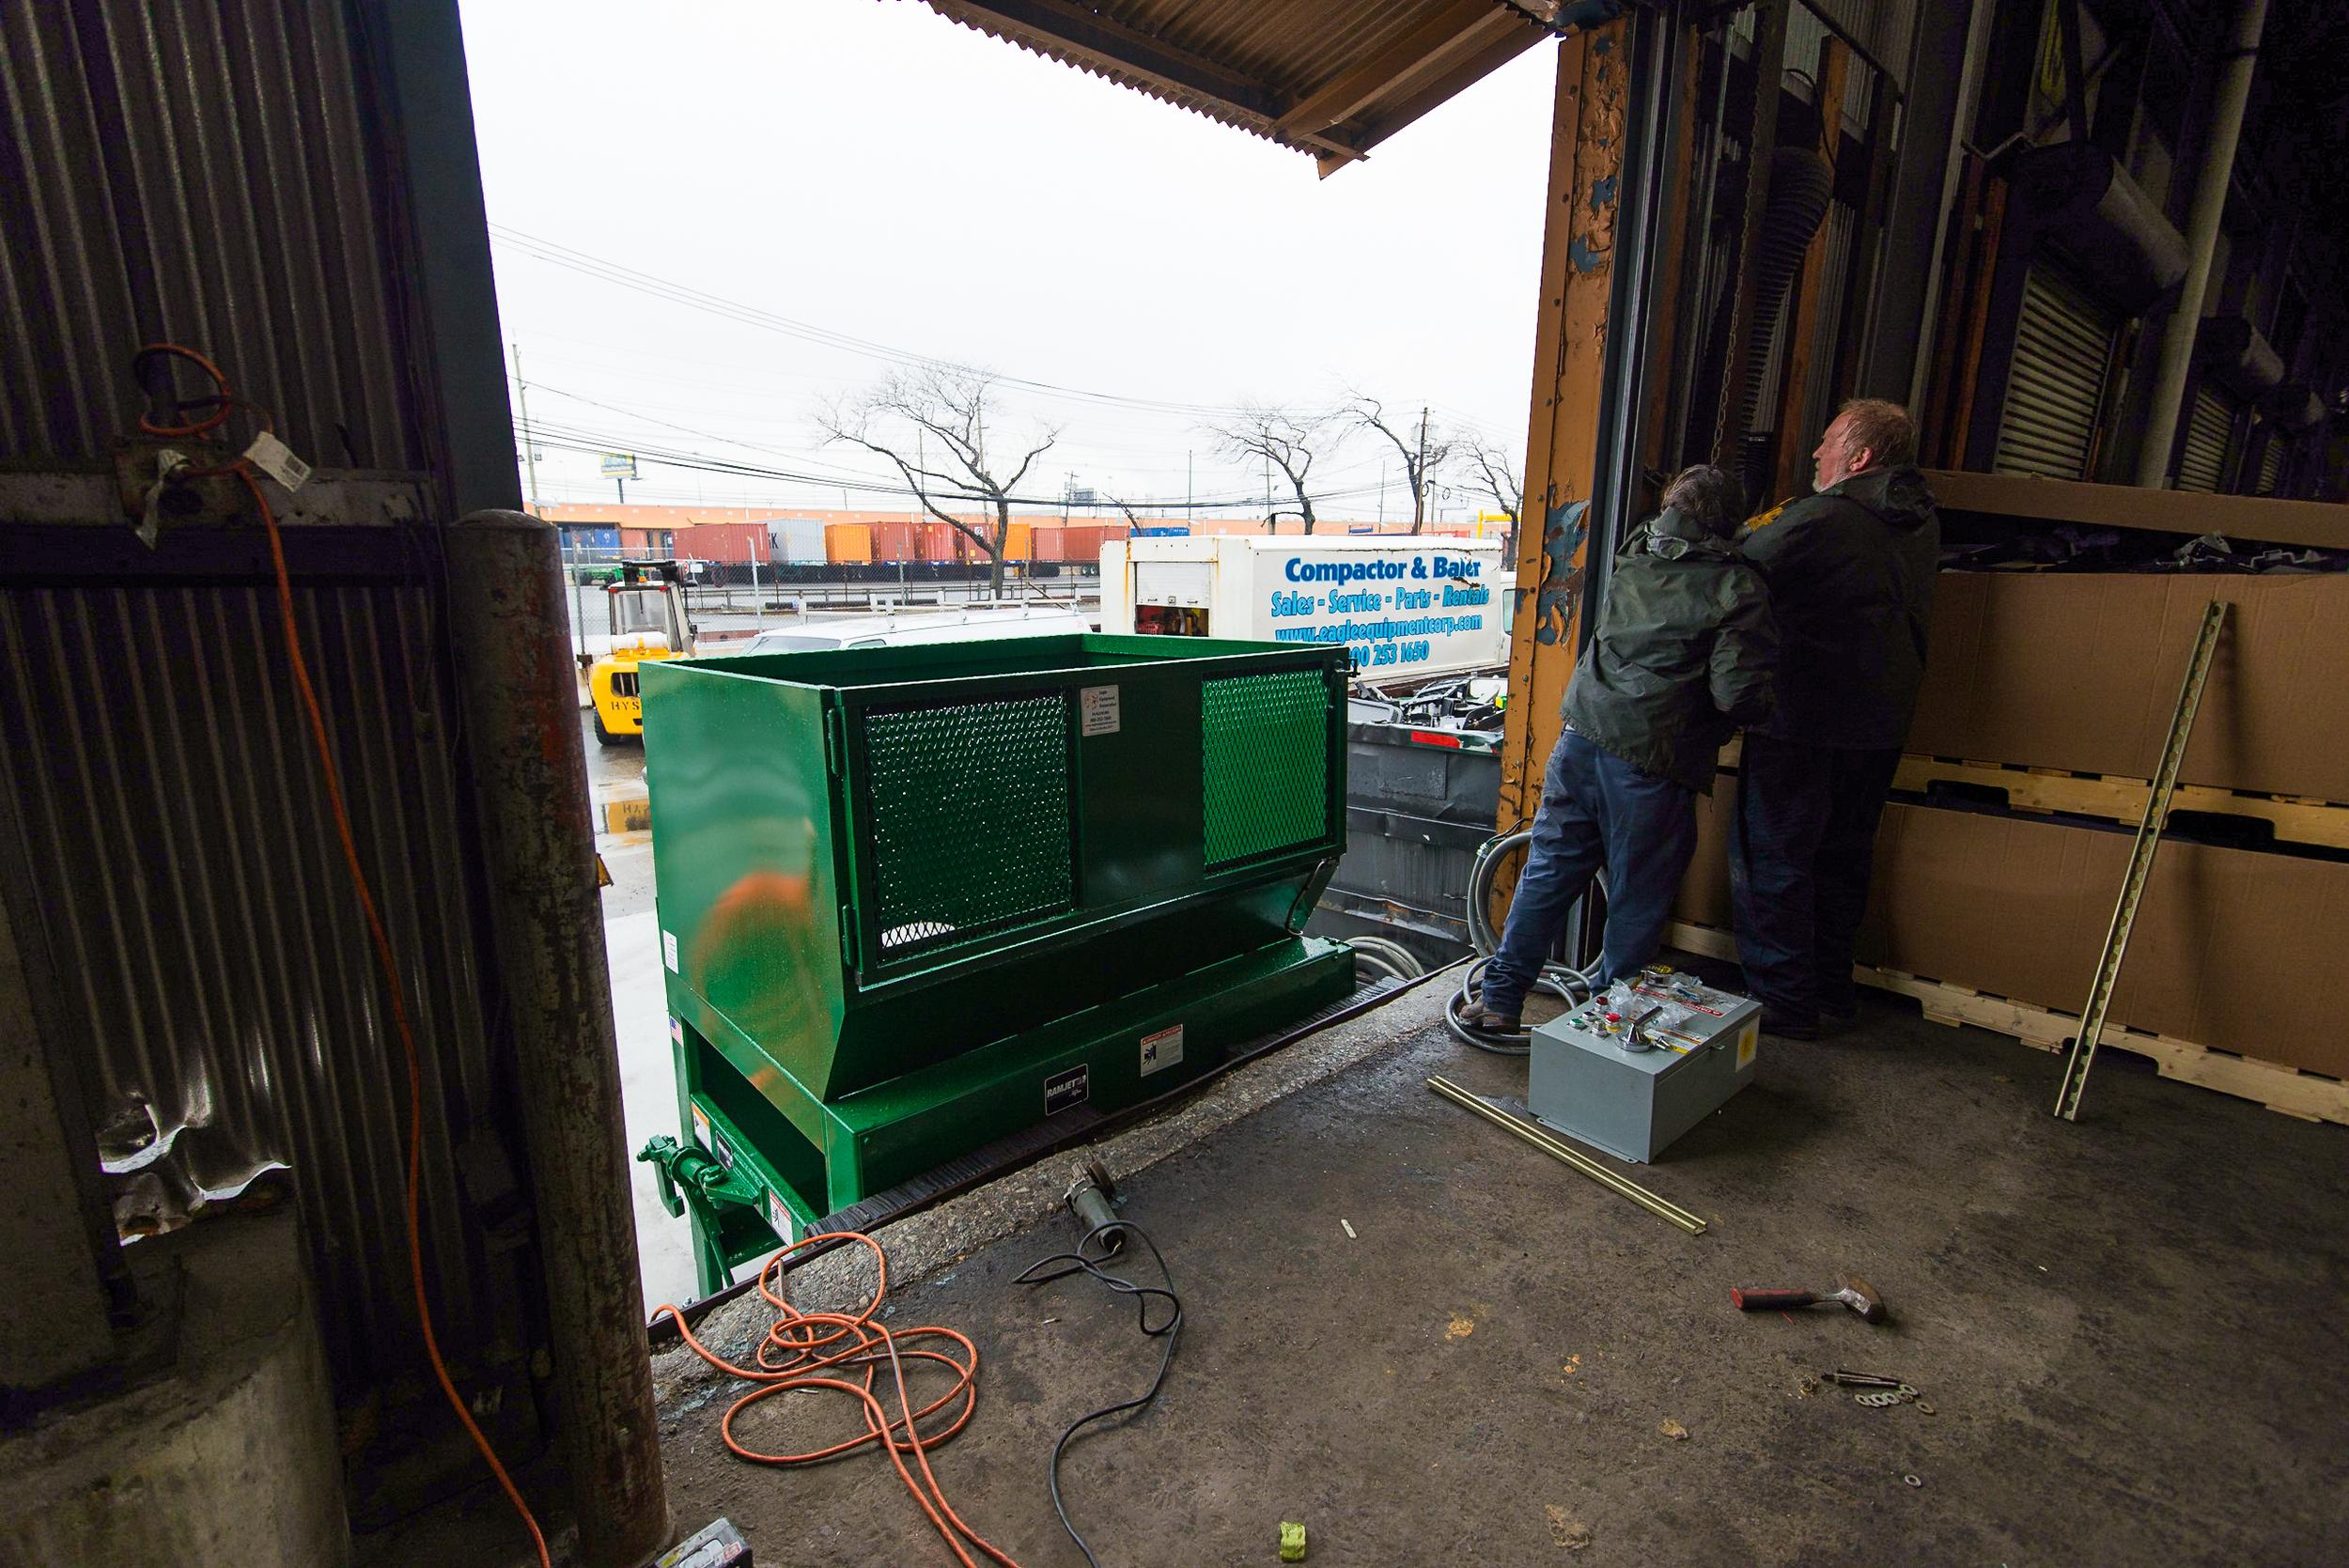 A Marathon Auger compactor installed in Port Newark, NJ